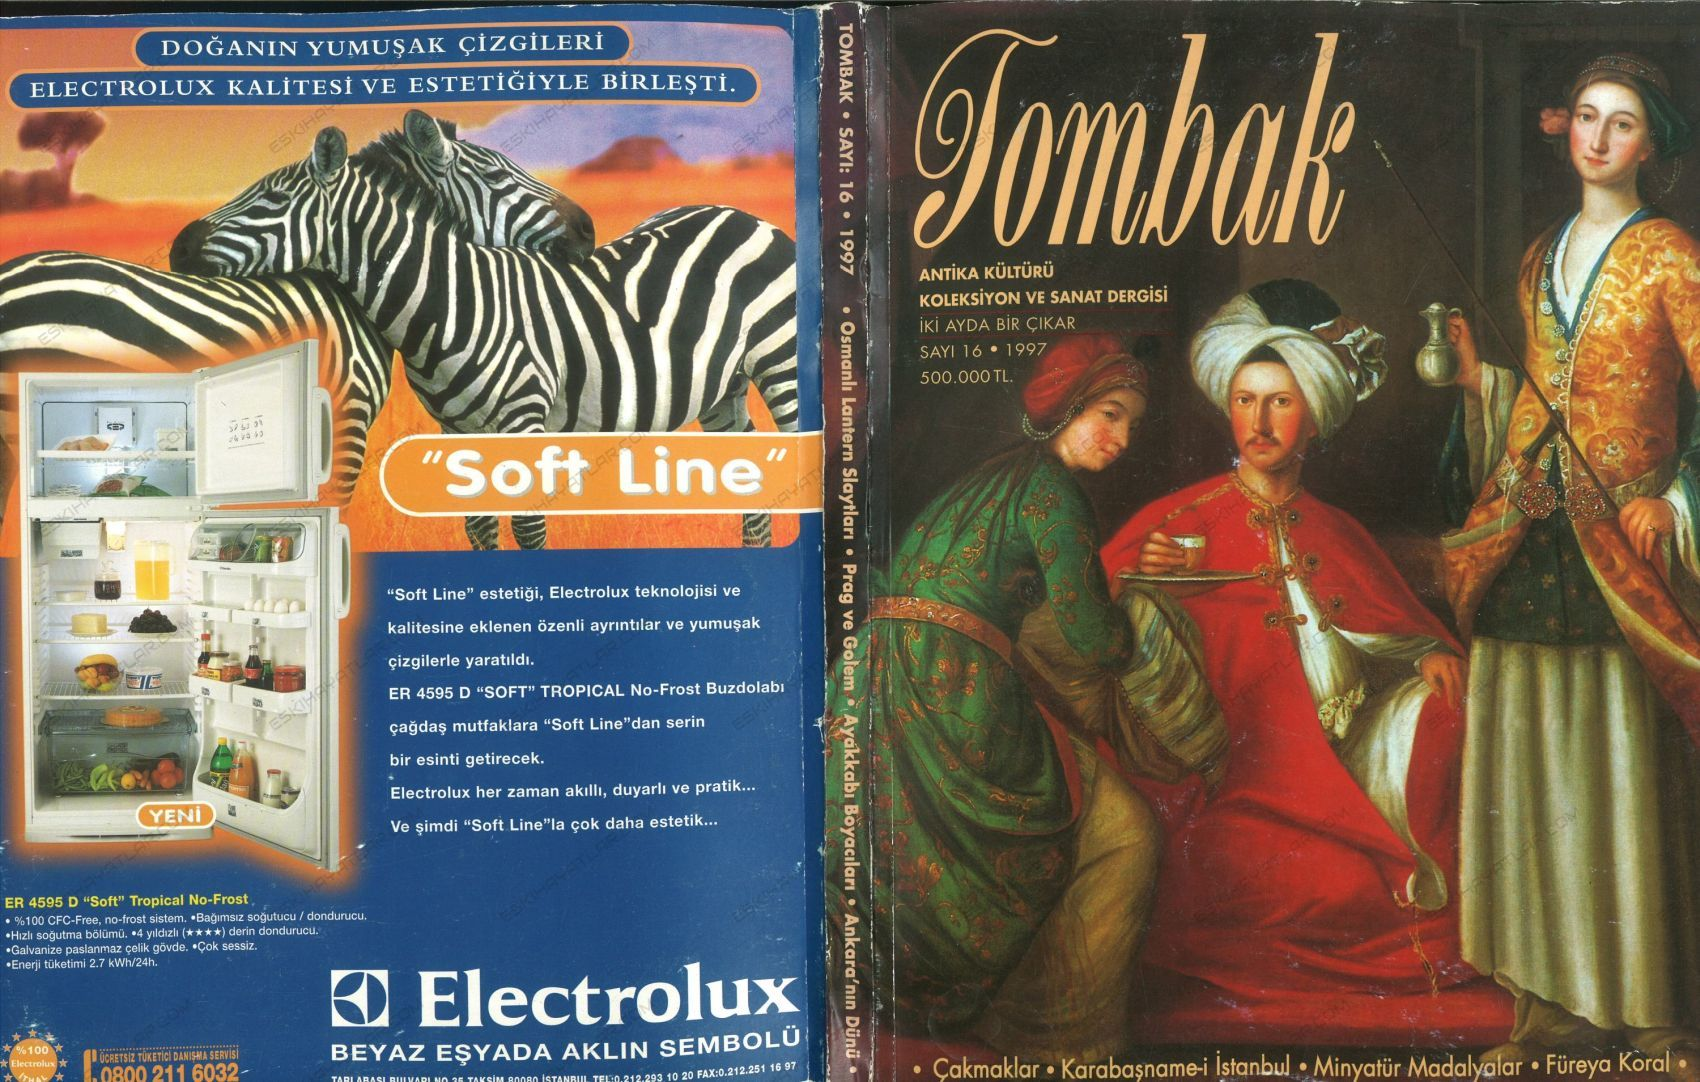 0293-cumhuriyet-doneminde-ankara-fotograflari-1997-tombak-dergisi-30-lu-yillarda-ankara-nasildi (1)